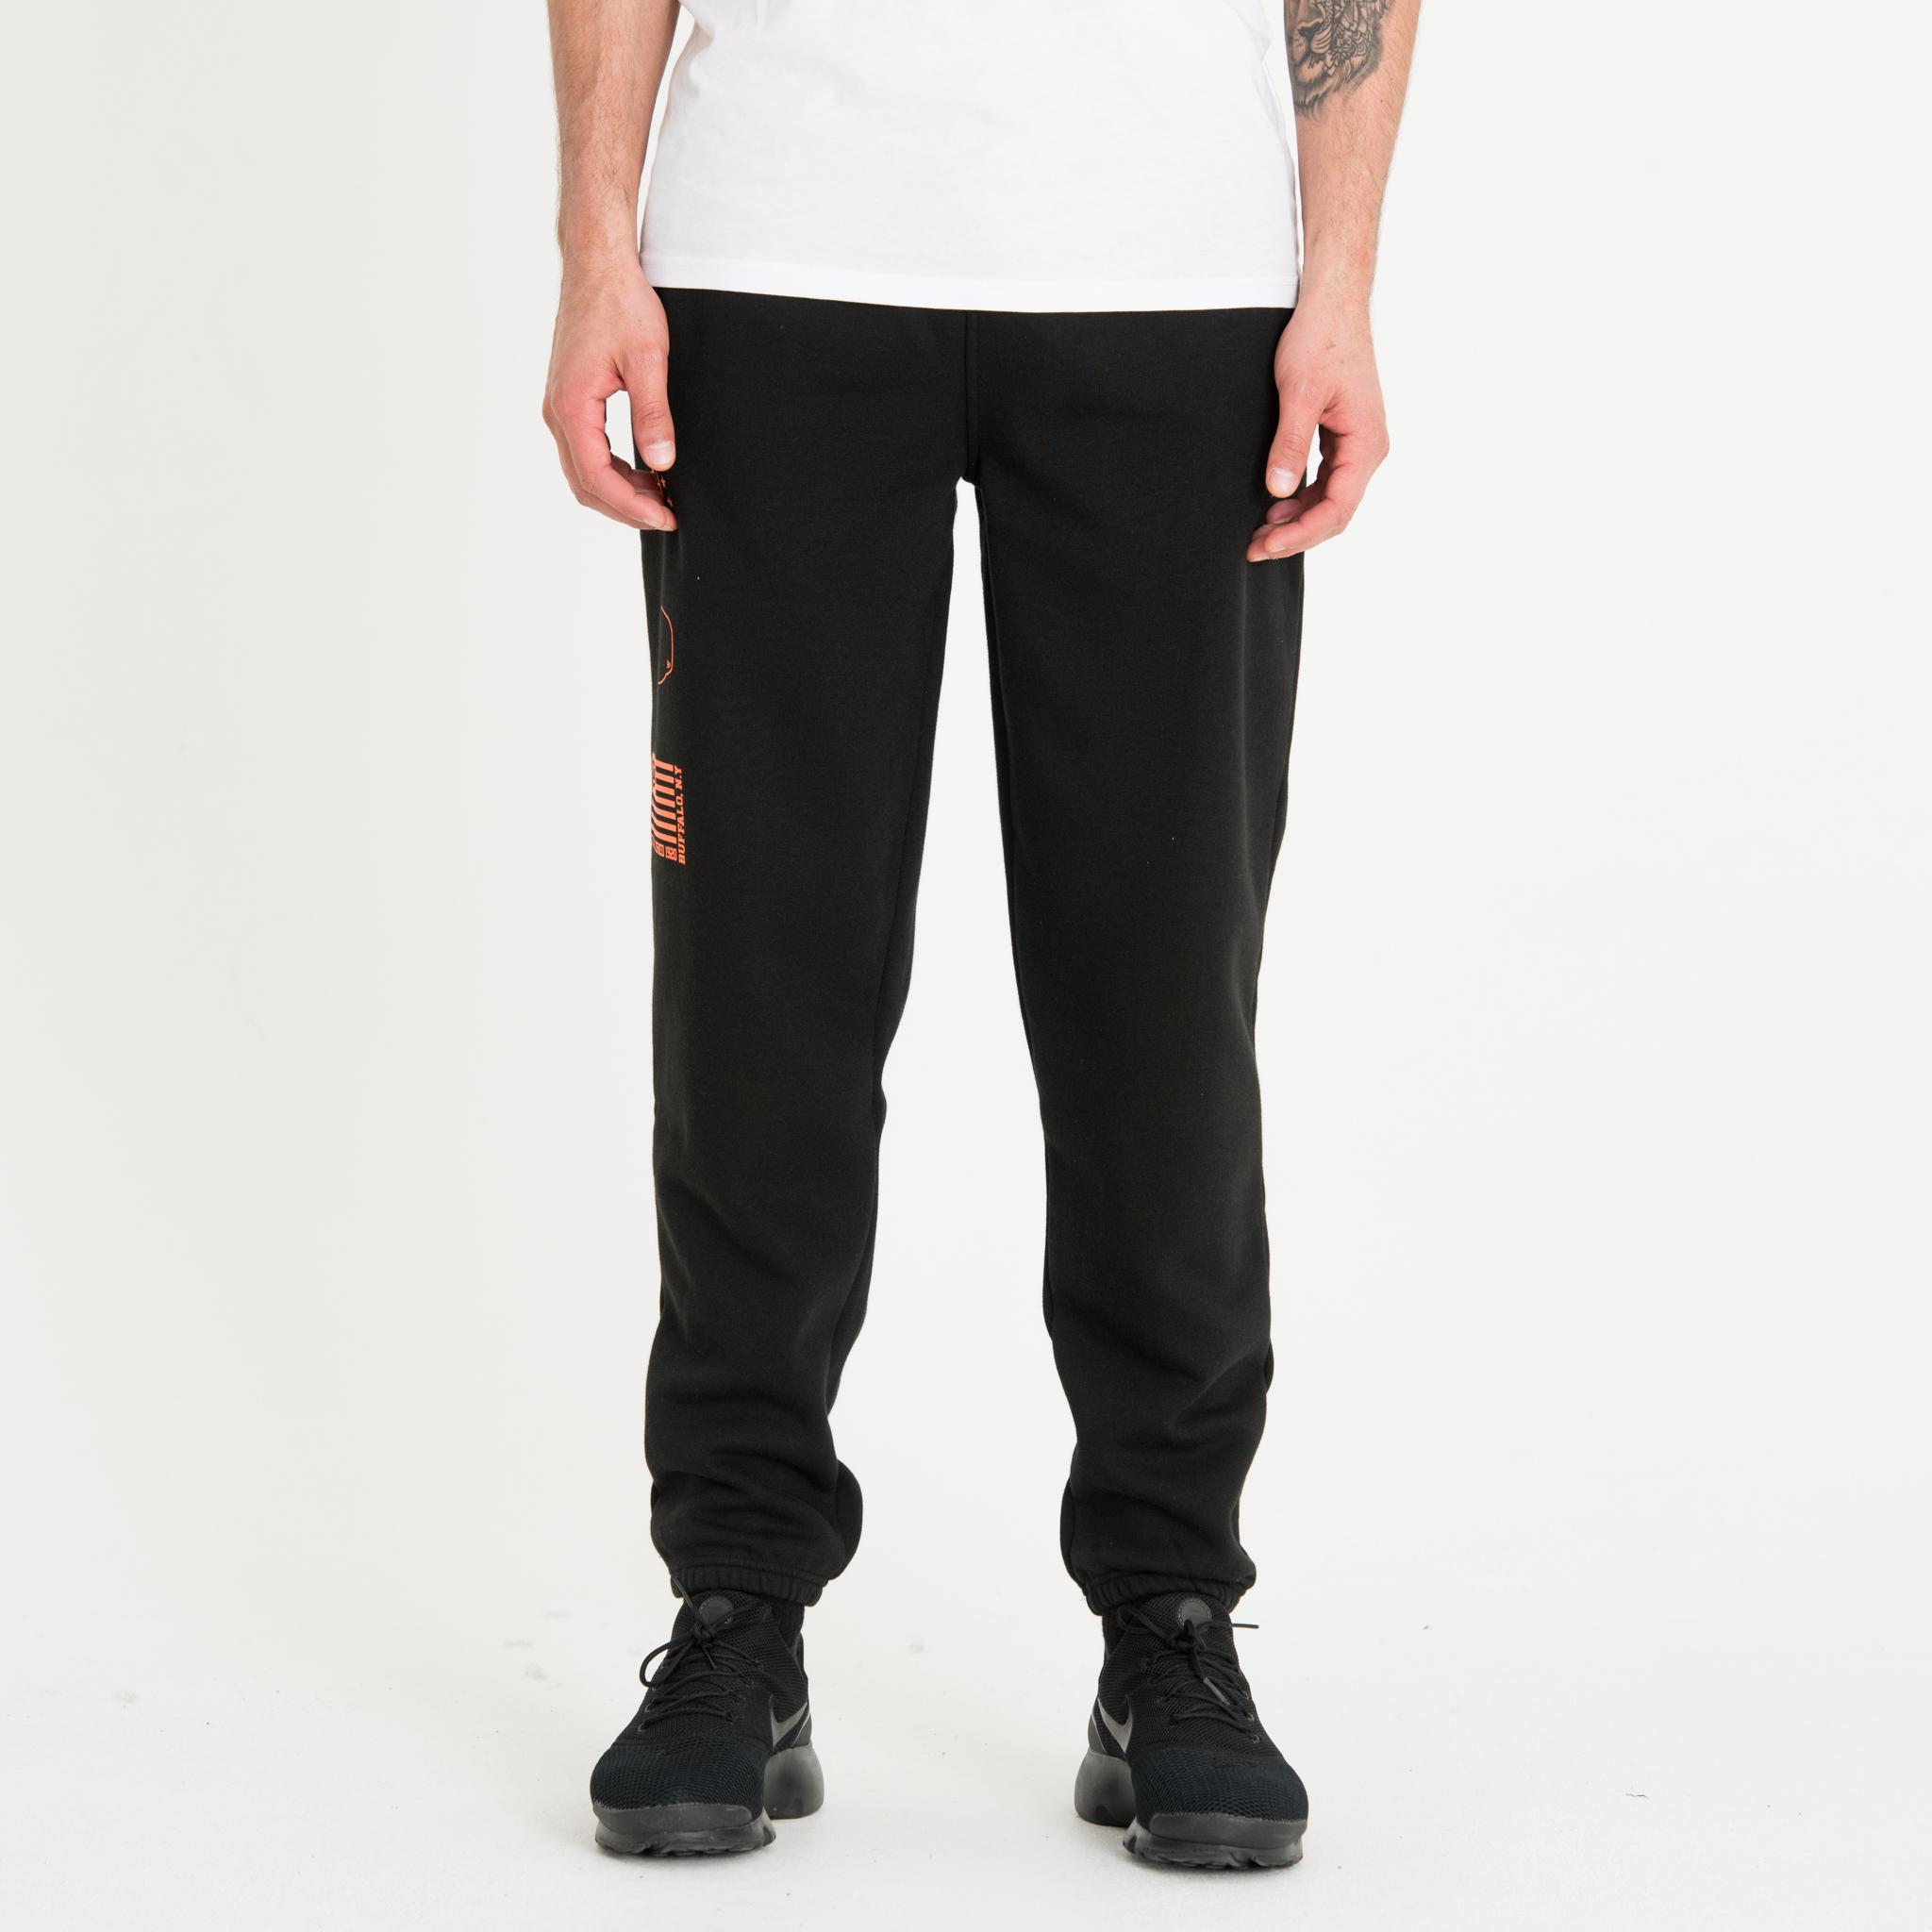 Pantalones de chándarl New Era Graphic, negro